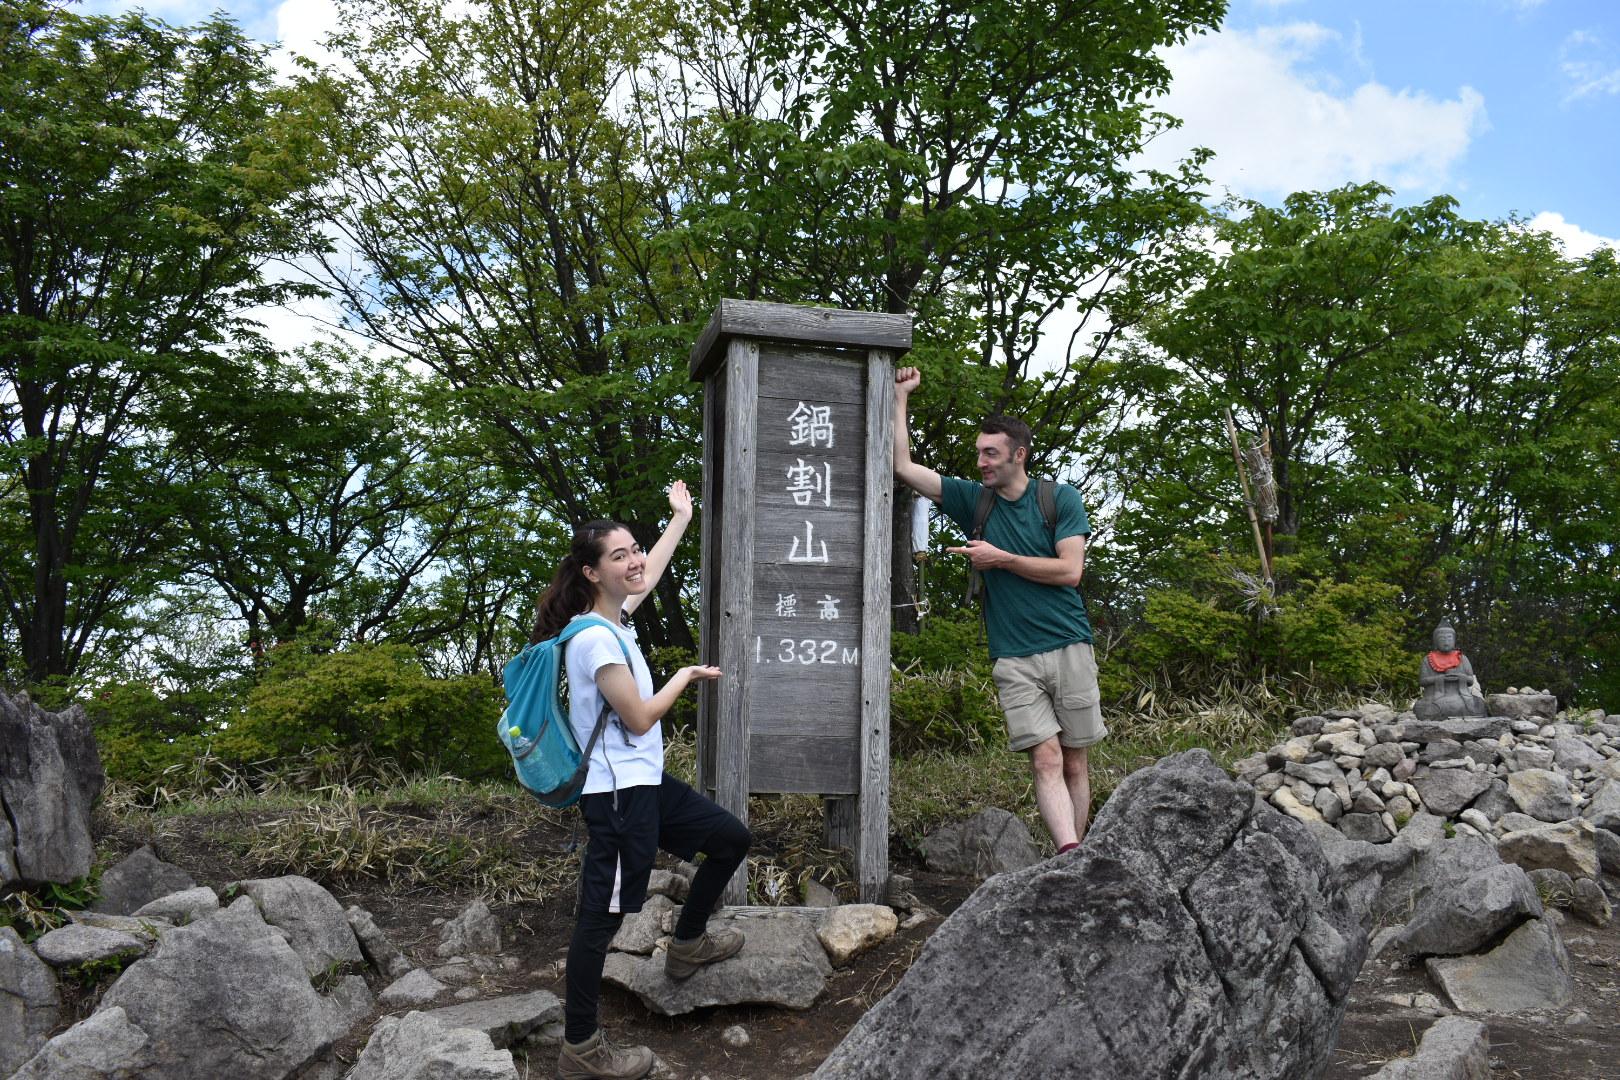 Two hikers at the Nabewariyama summit signpost